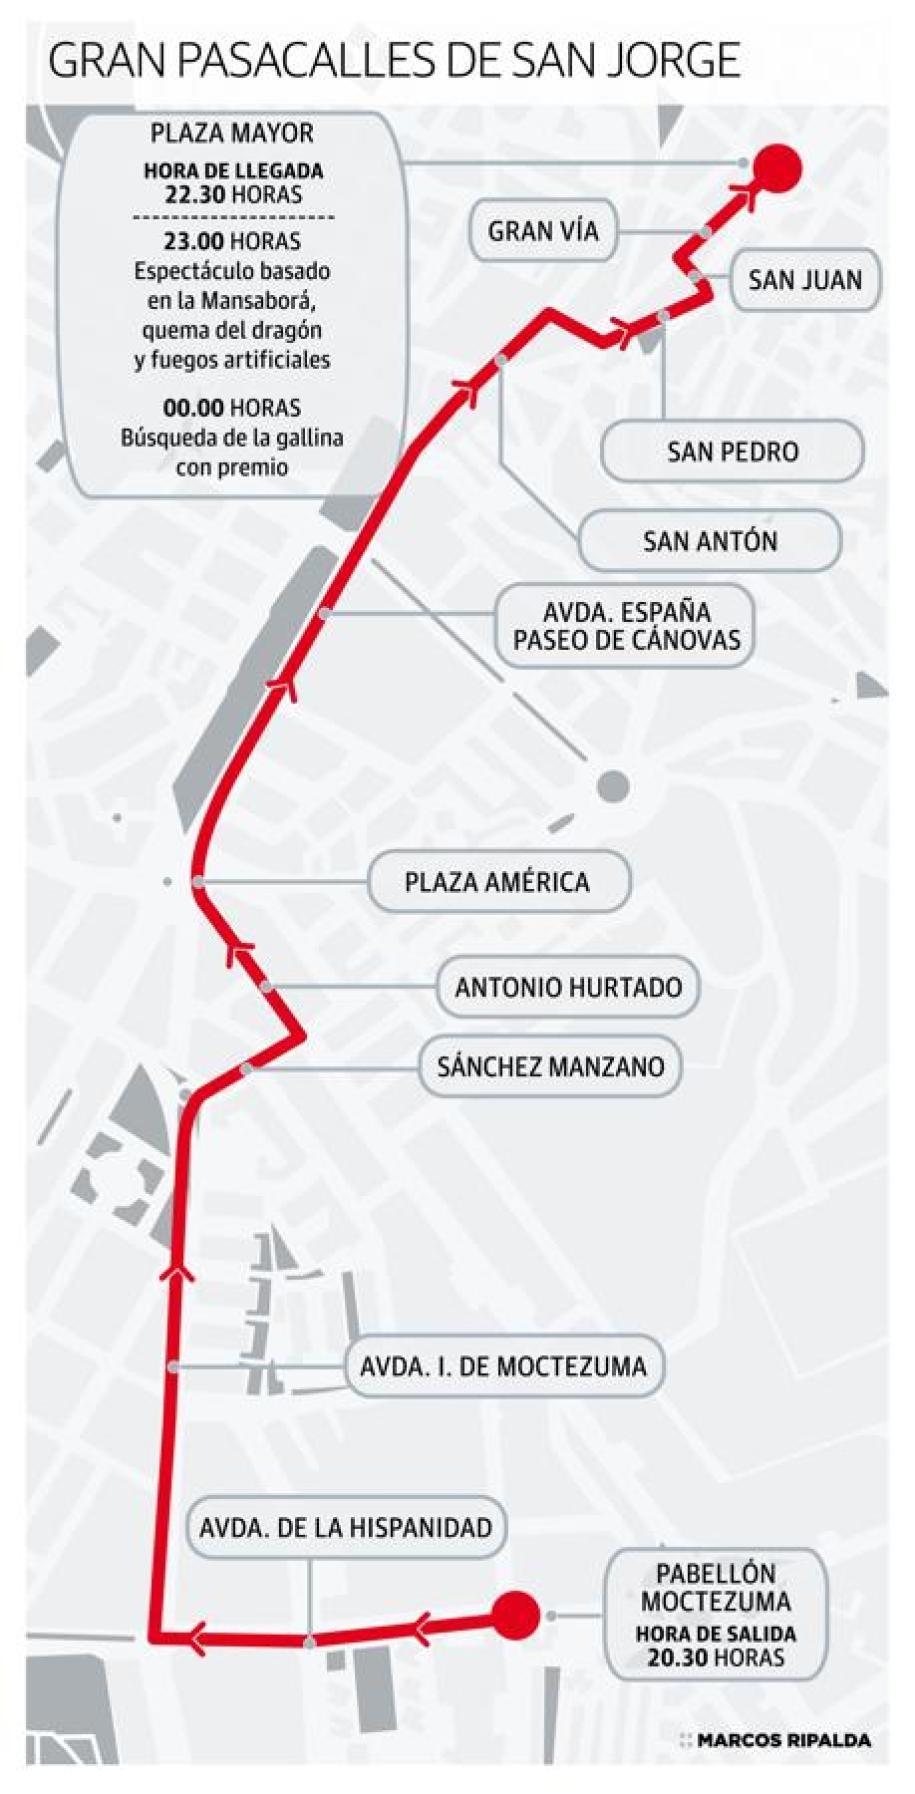 mapa de recorrido